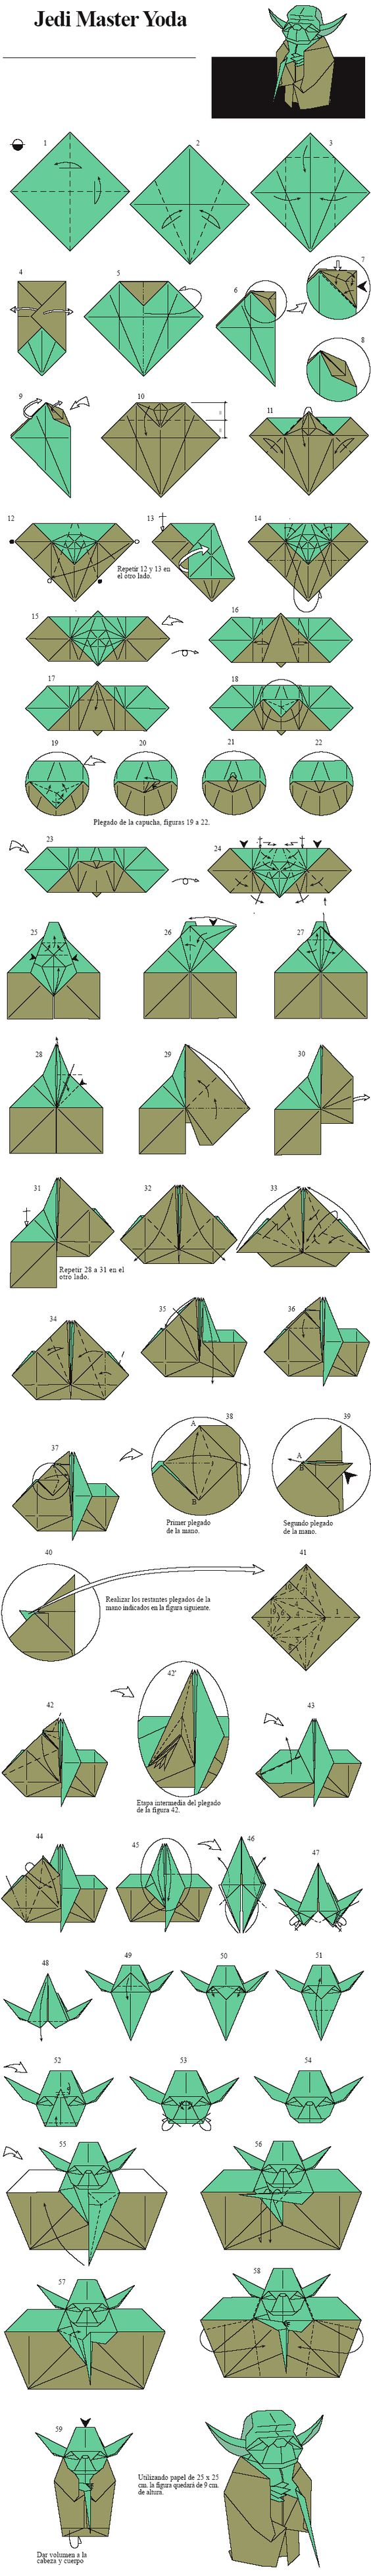 Origami Jedi Master Yoda Designed By Fumiaki Kawahata Crafts Video Diagram Quotswan Quyetquot